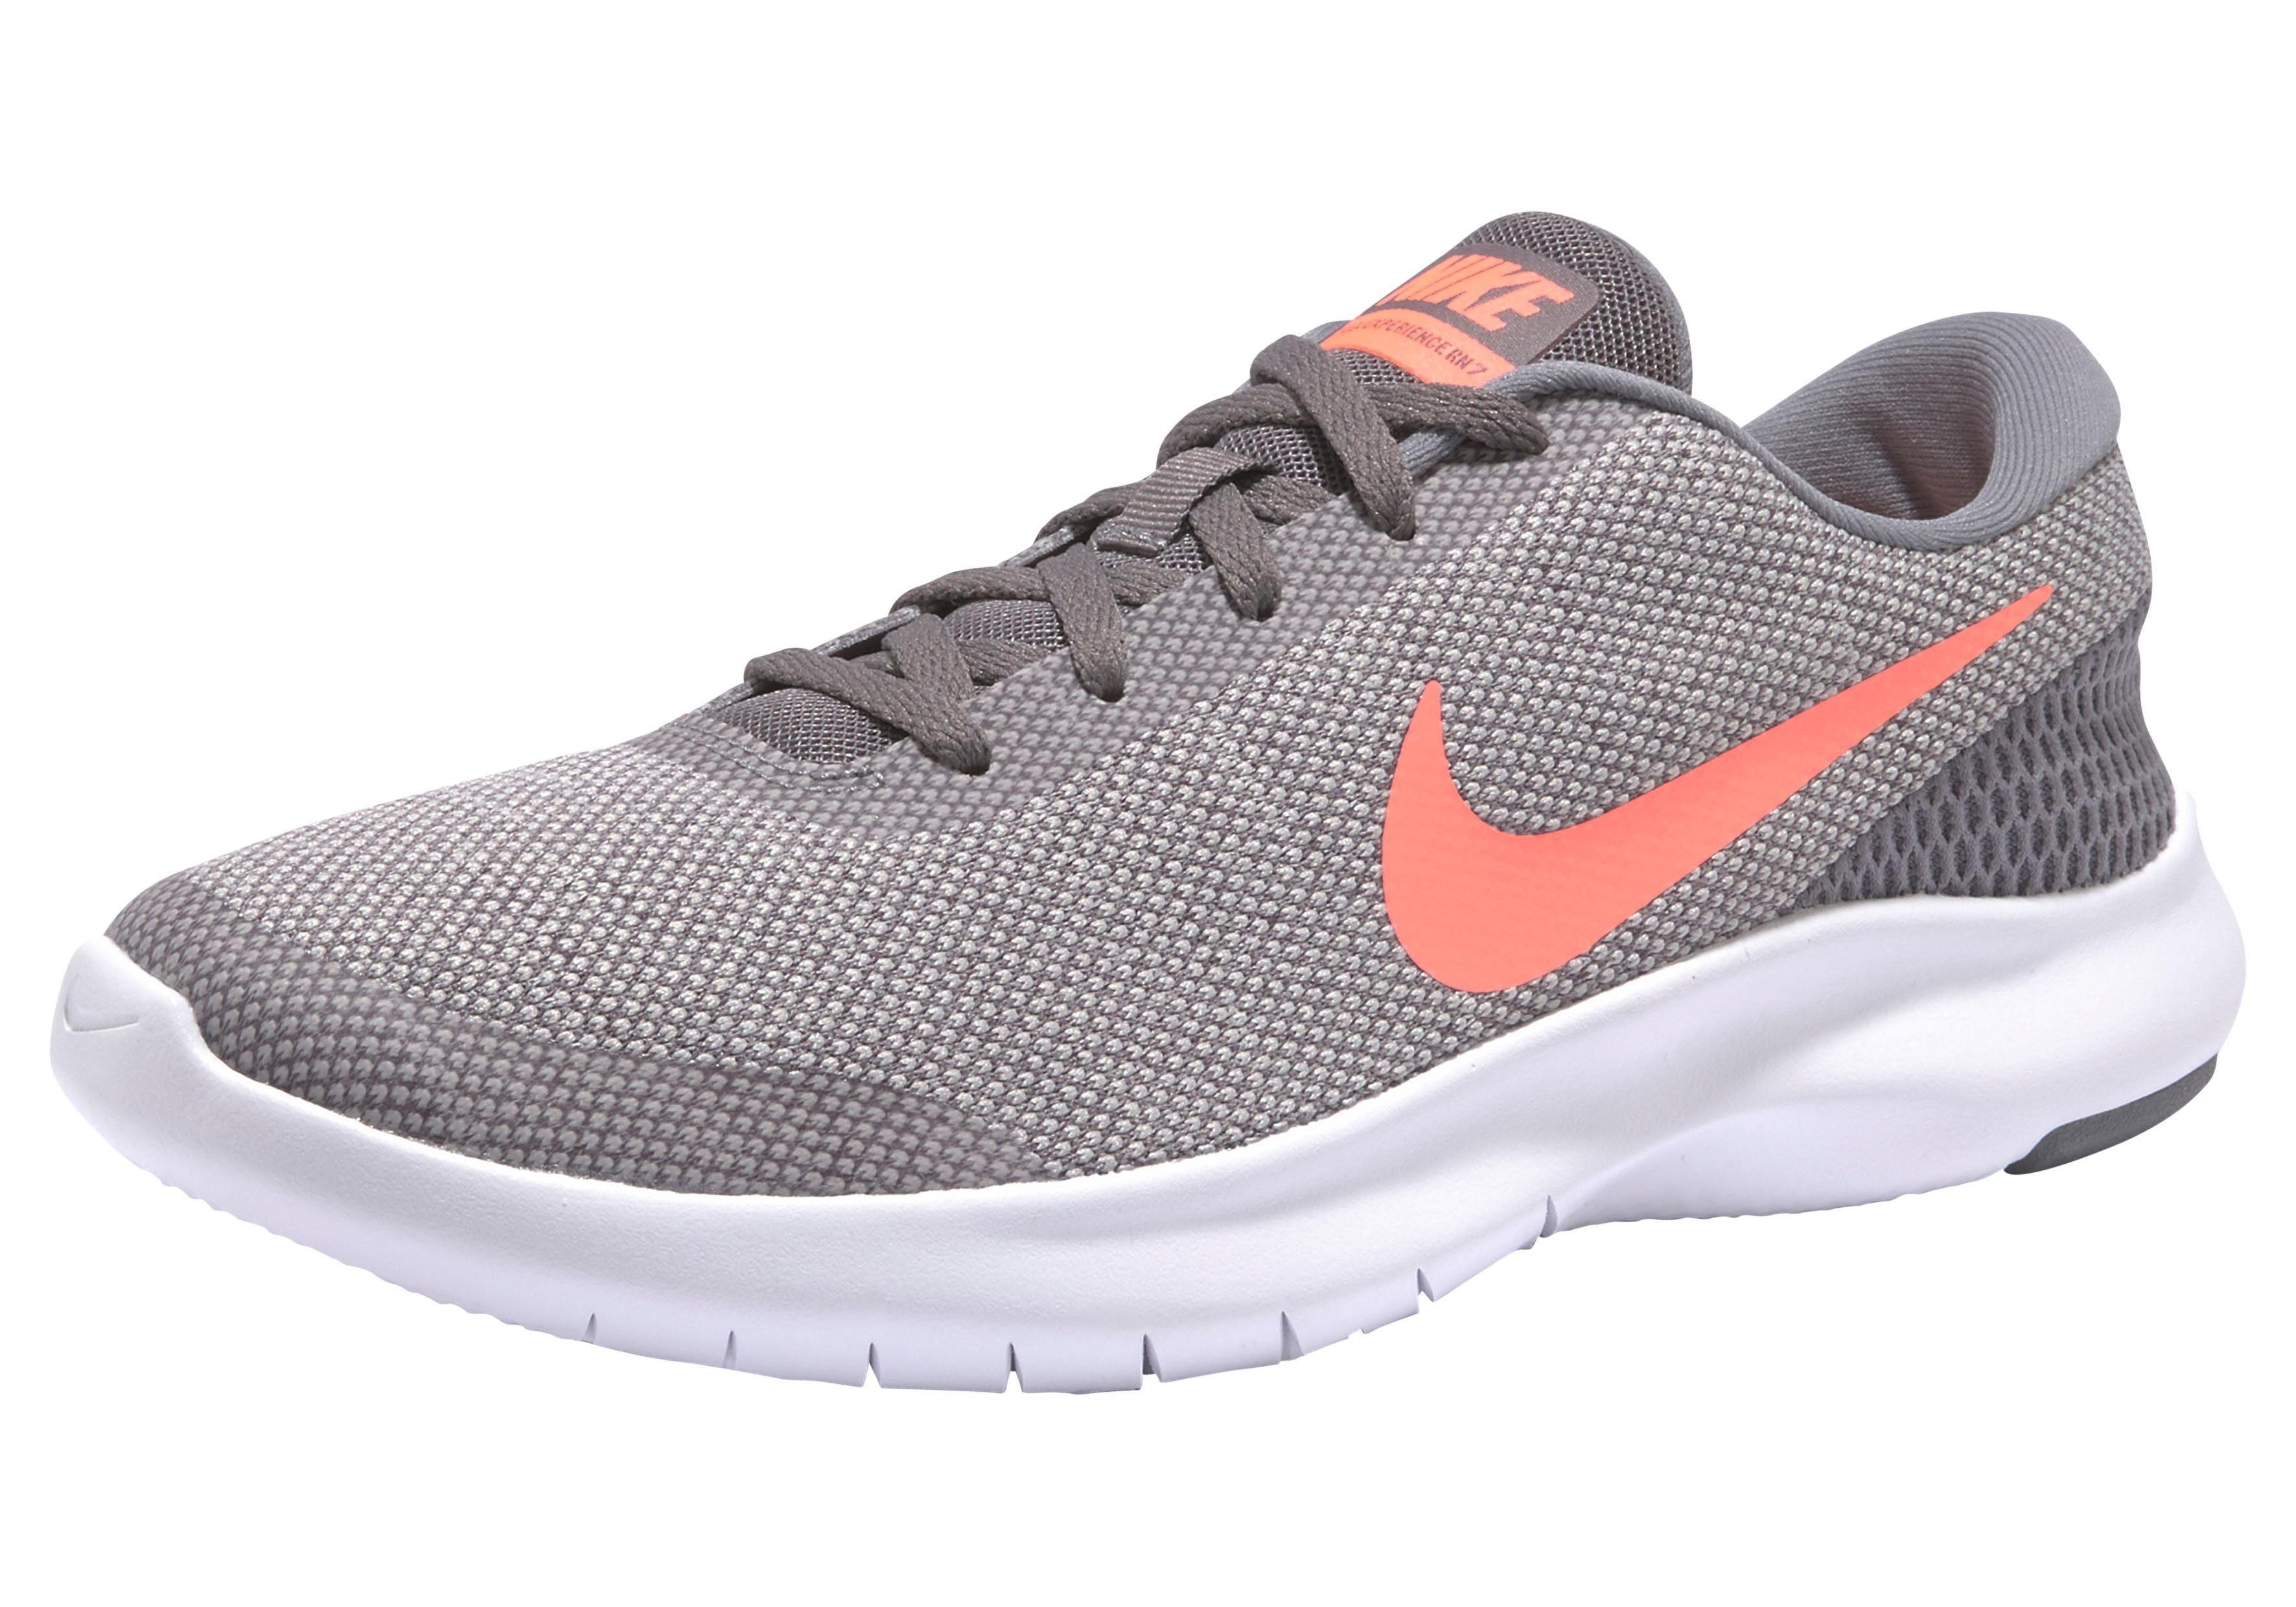 Nike »Wmns Flex Experience Run 7« Laufschuh kaufen | OTTO